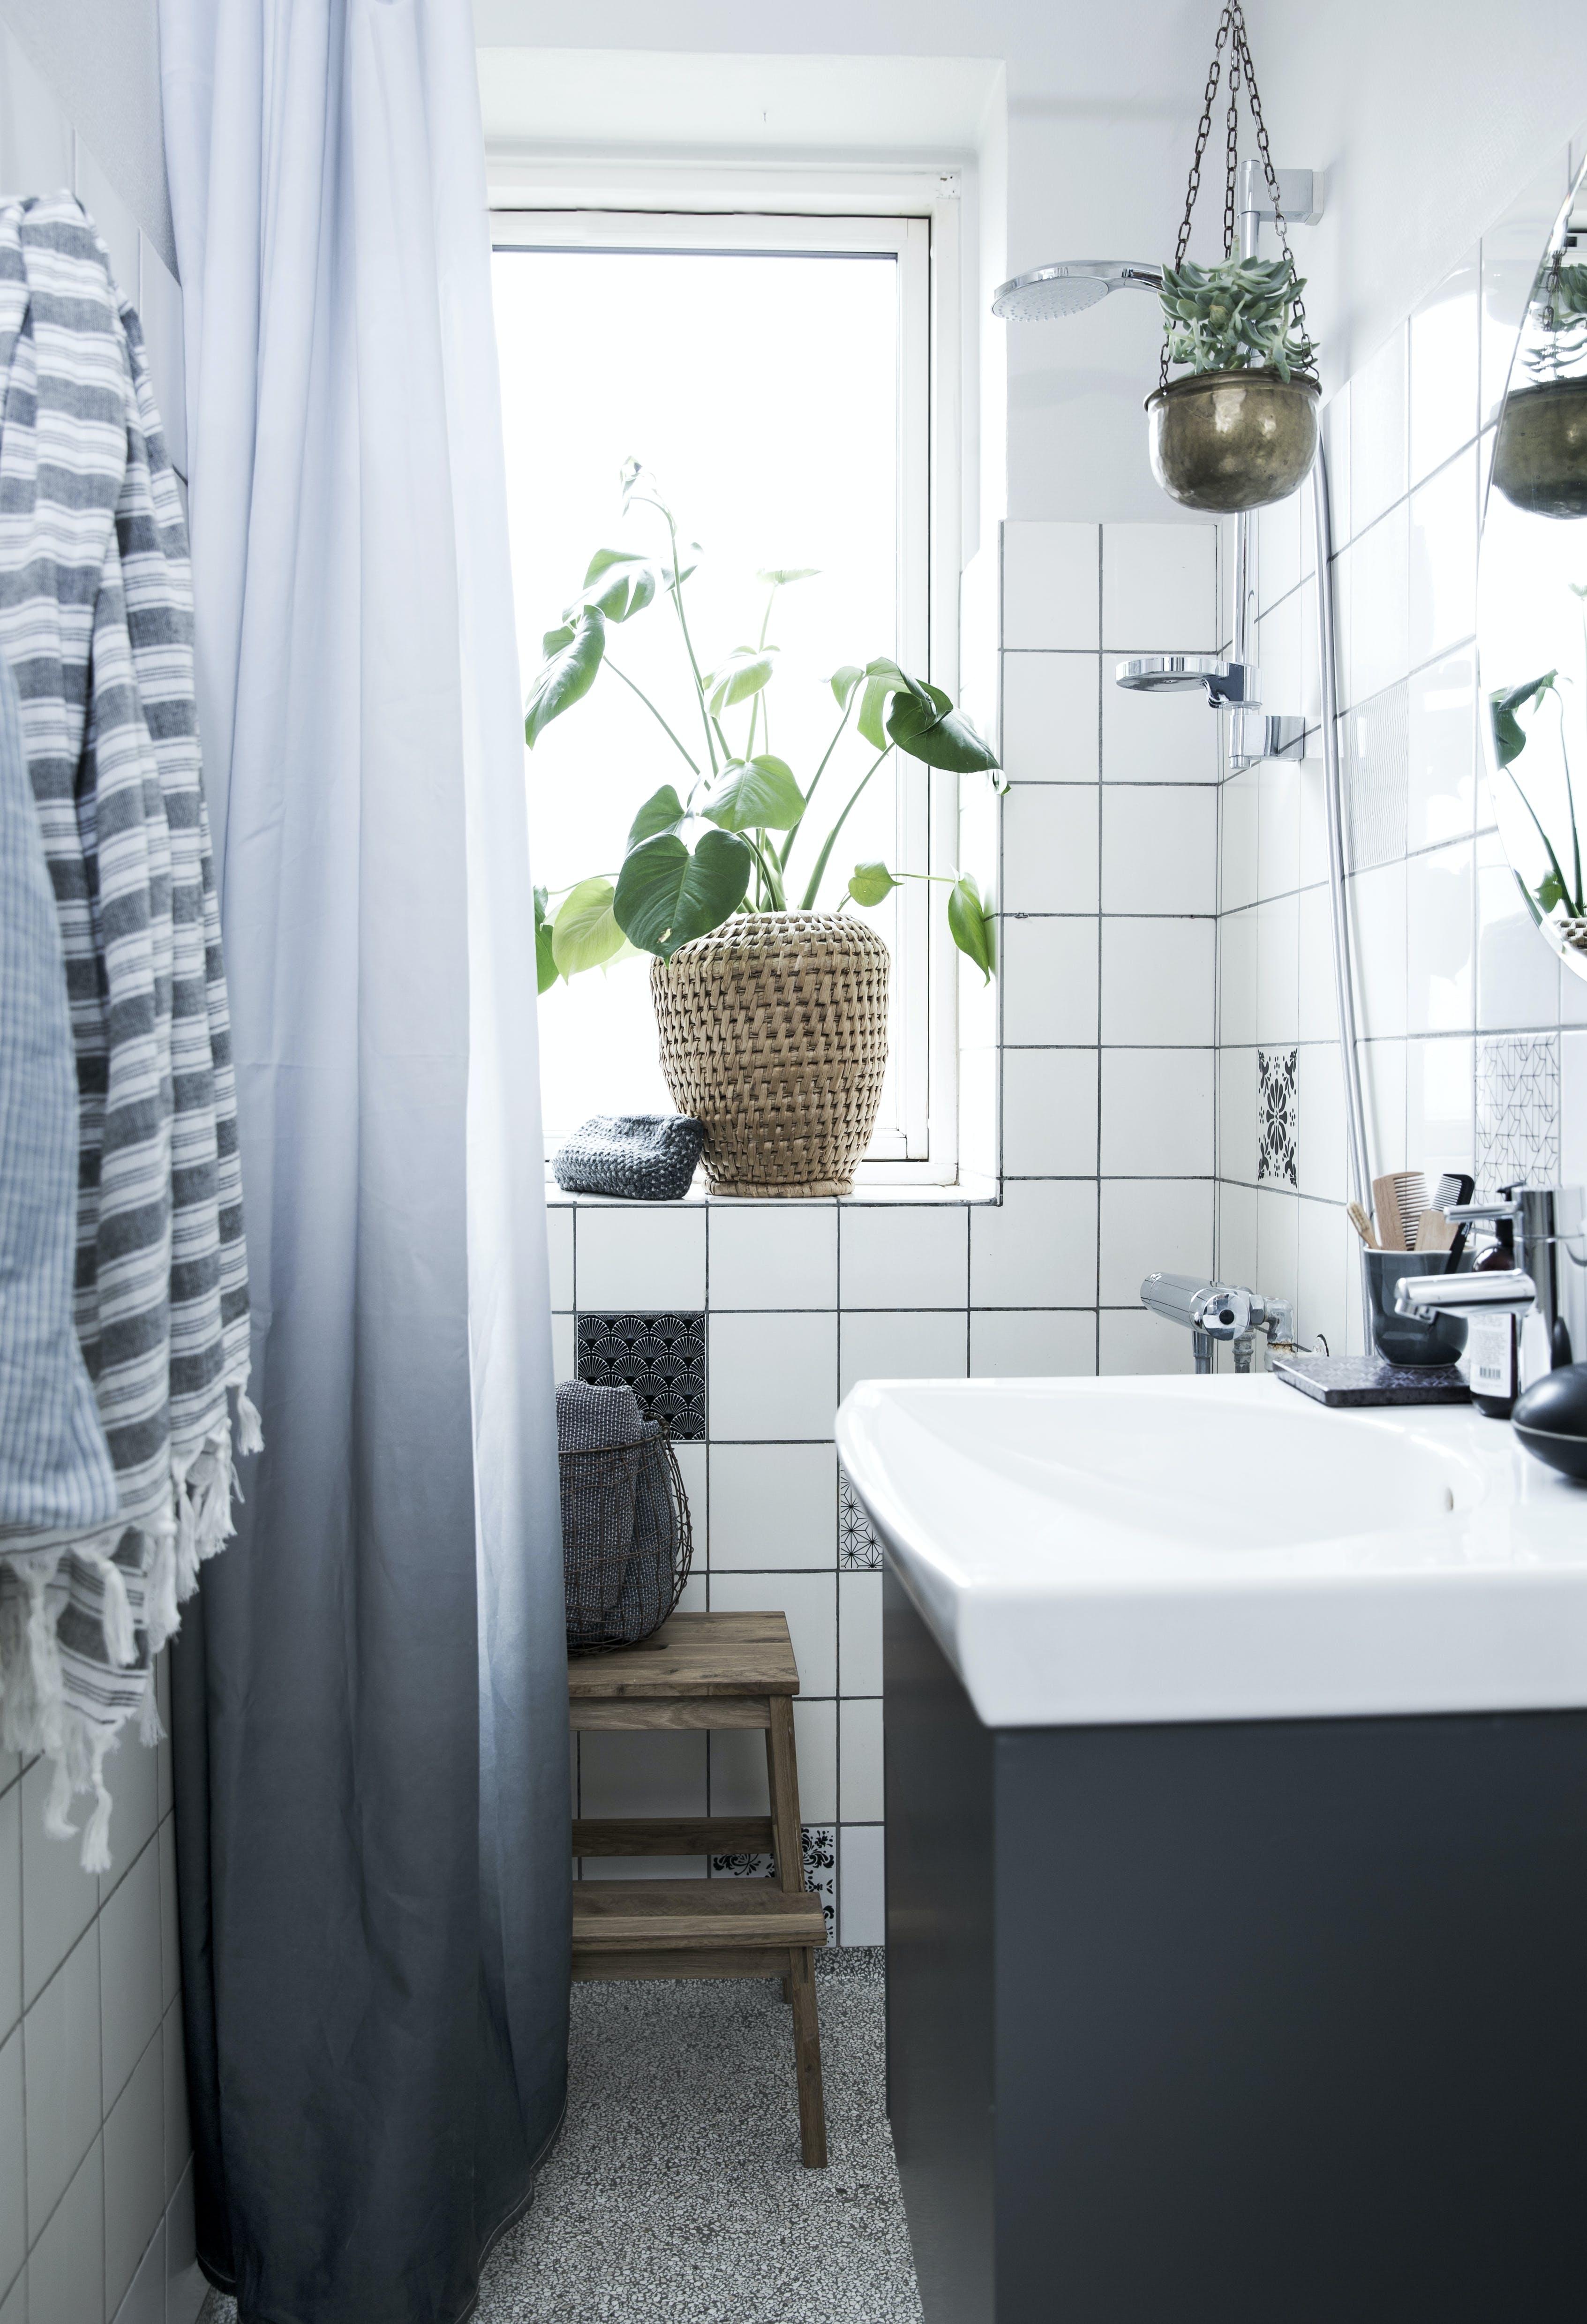 Badeværelse, som Mette Helena Rasmussen har hjulpet med at indrette.